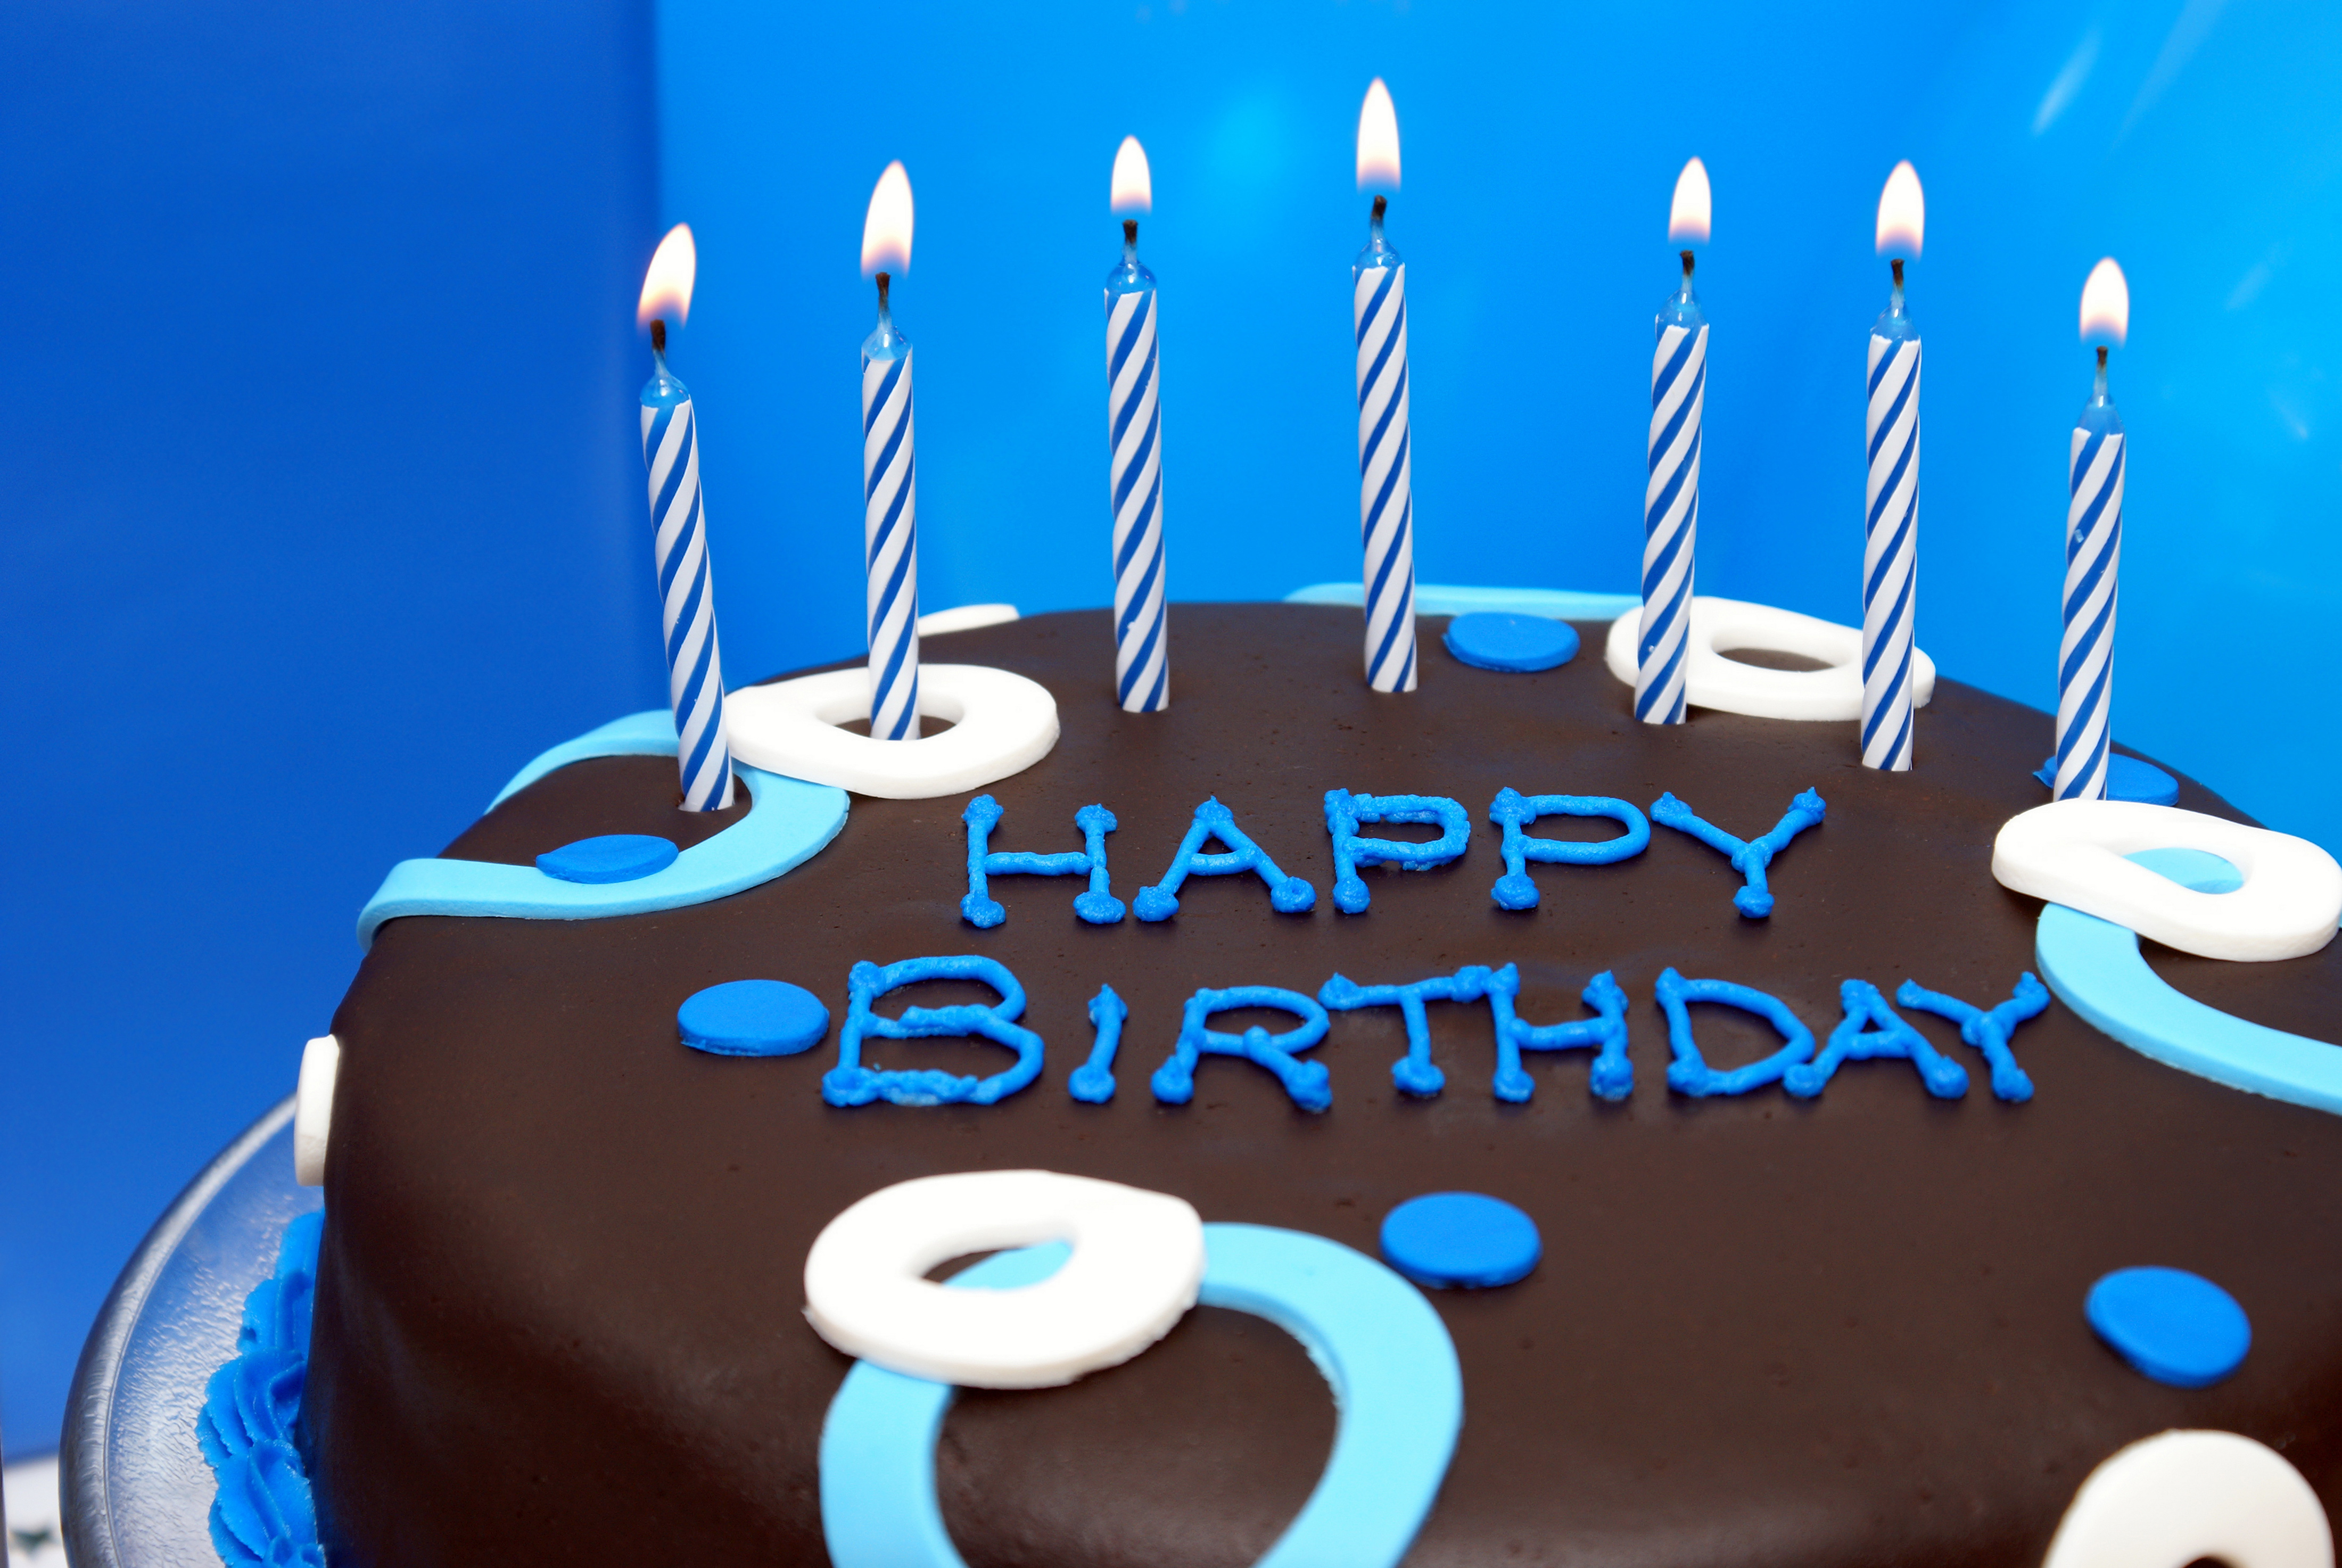 С днем рождения мужчине торт картинки